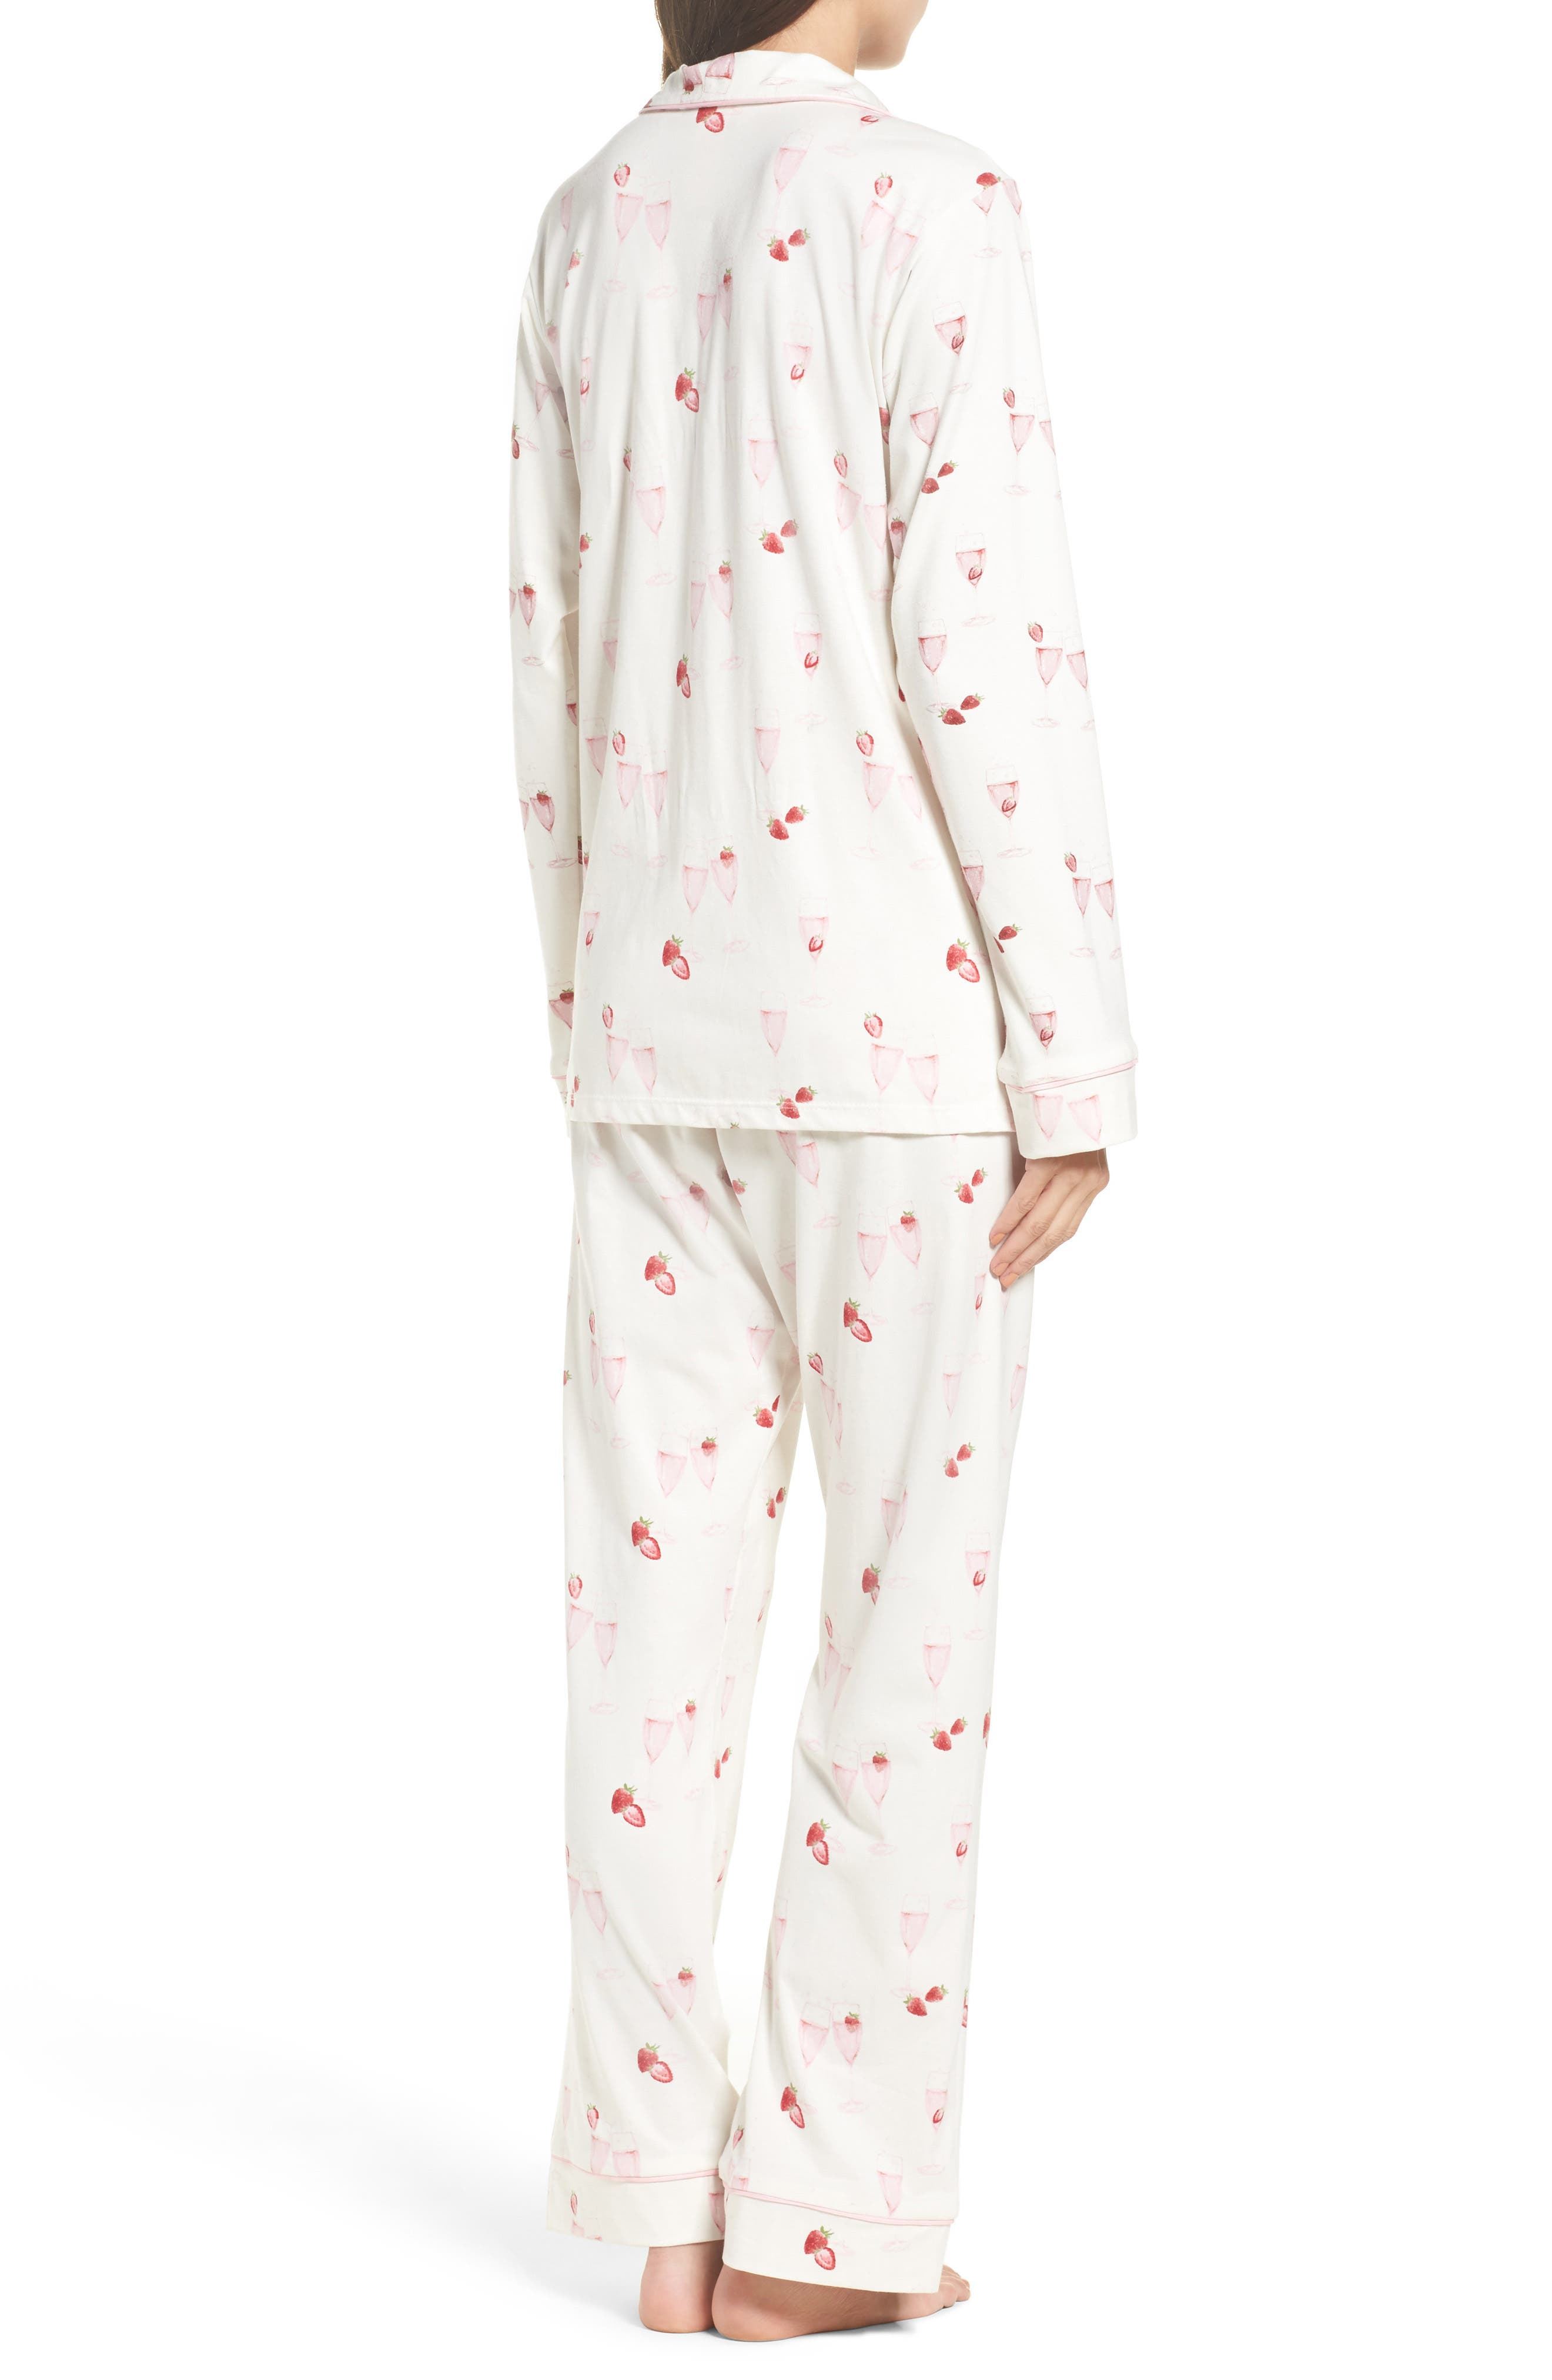 Strawberries & Champagne Print Pajamas,                             Alternate thumbnail 2, color,                             Strawberries And Champagne